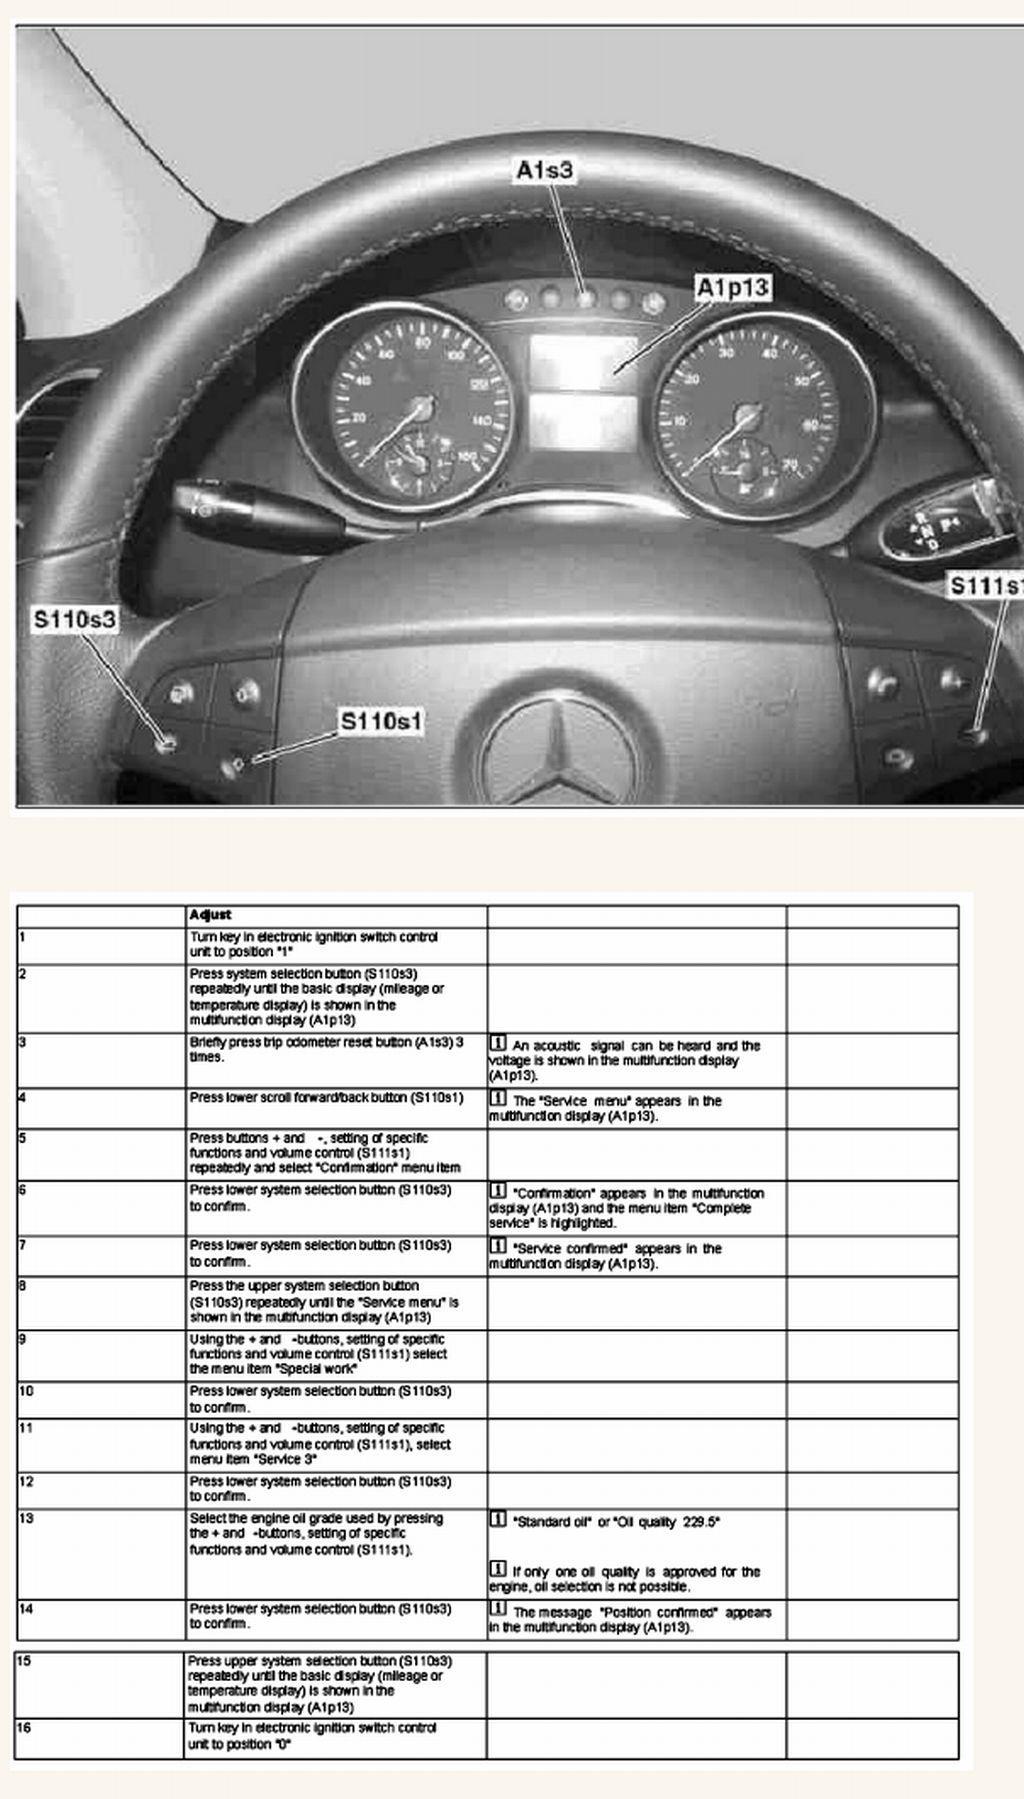 Mercedes ml320 service intervals for Mercedes benz oil change interval